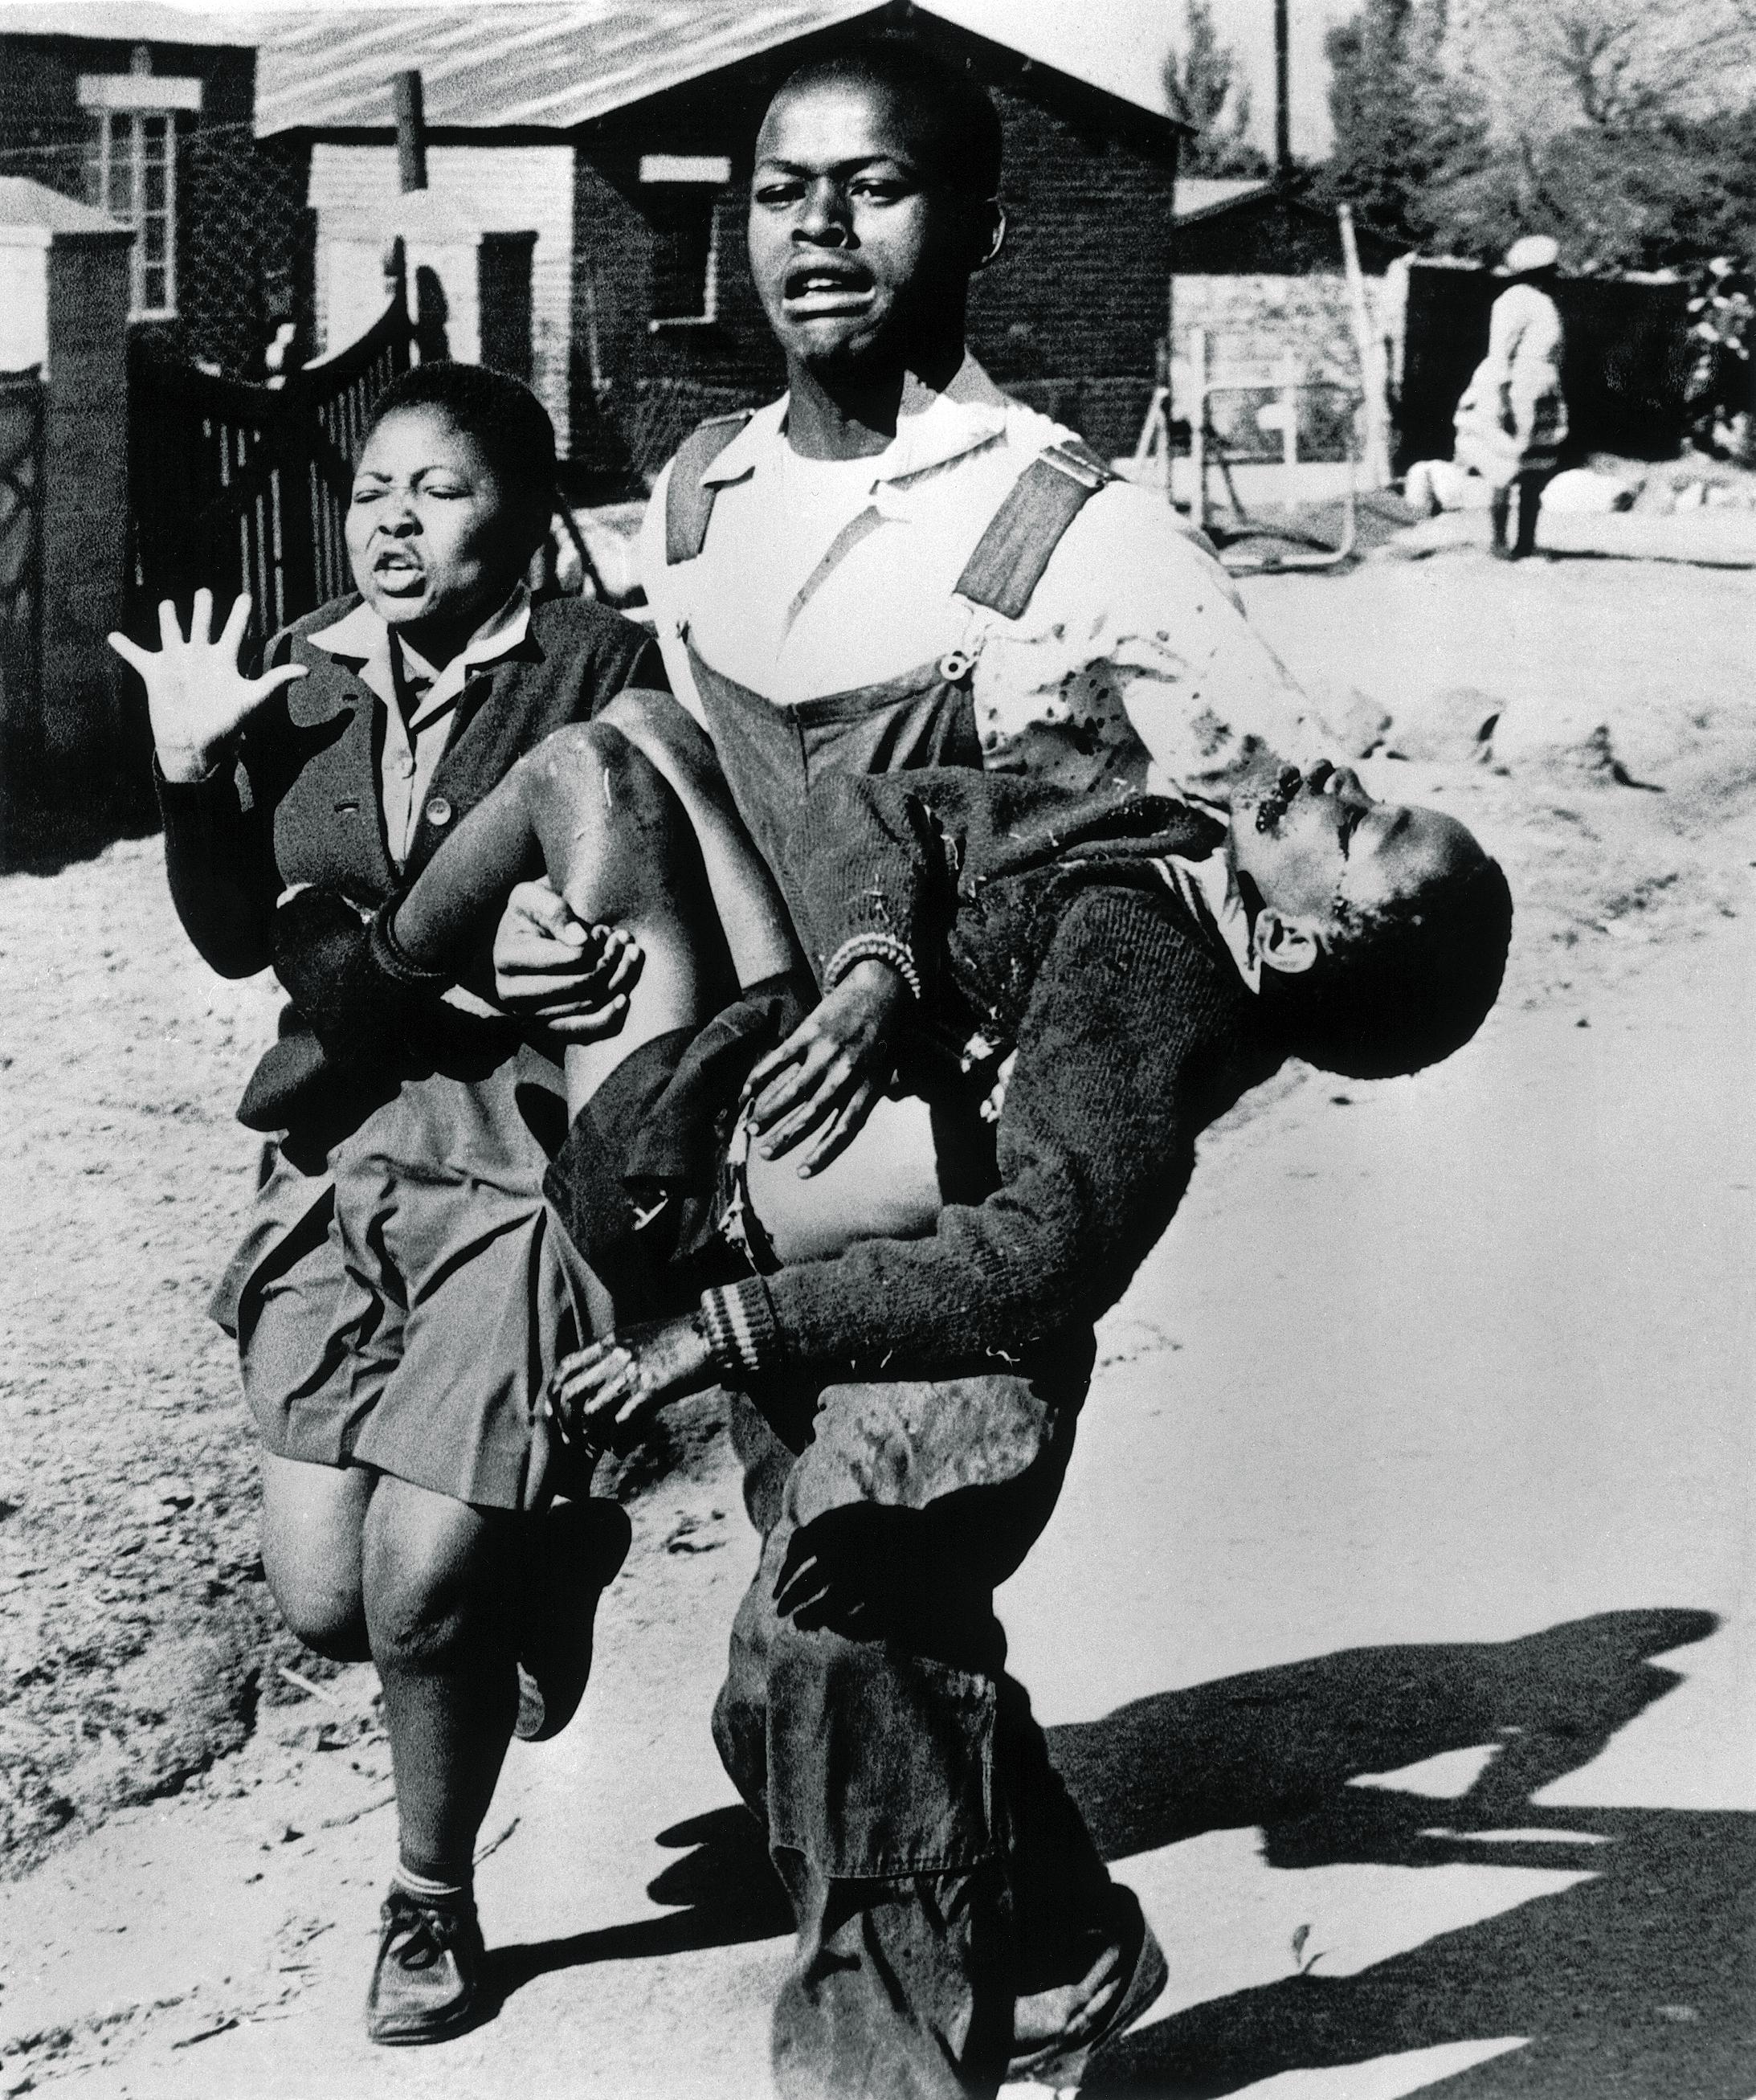 Hector Petersen in Soweto, South Africa, June 1976